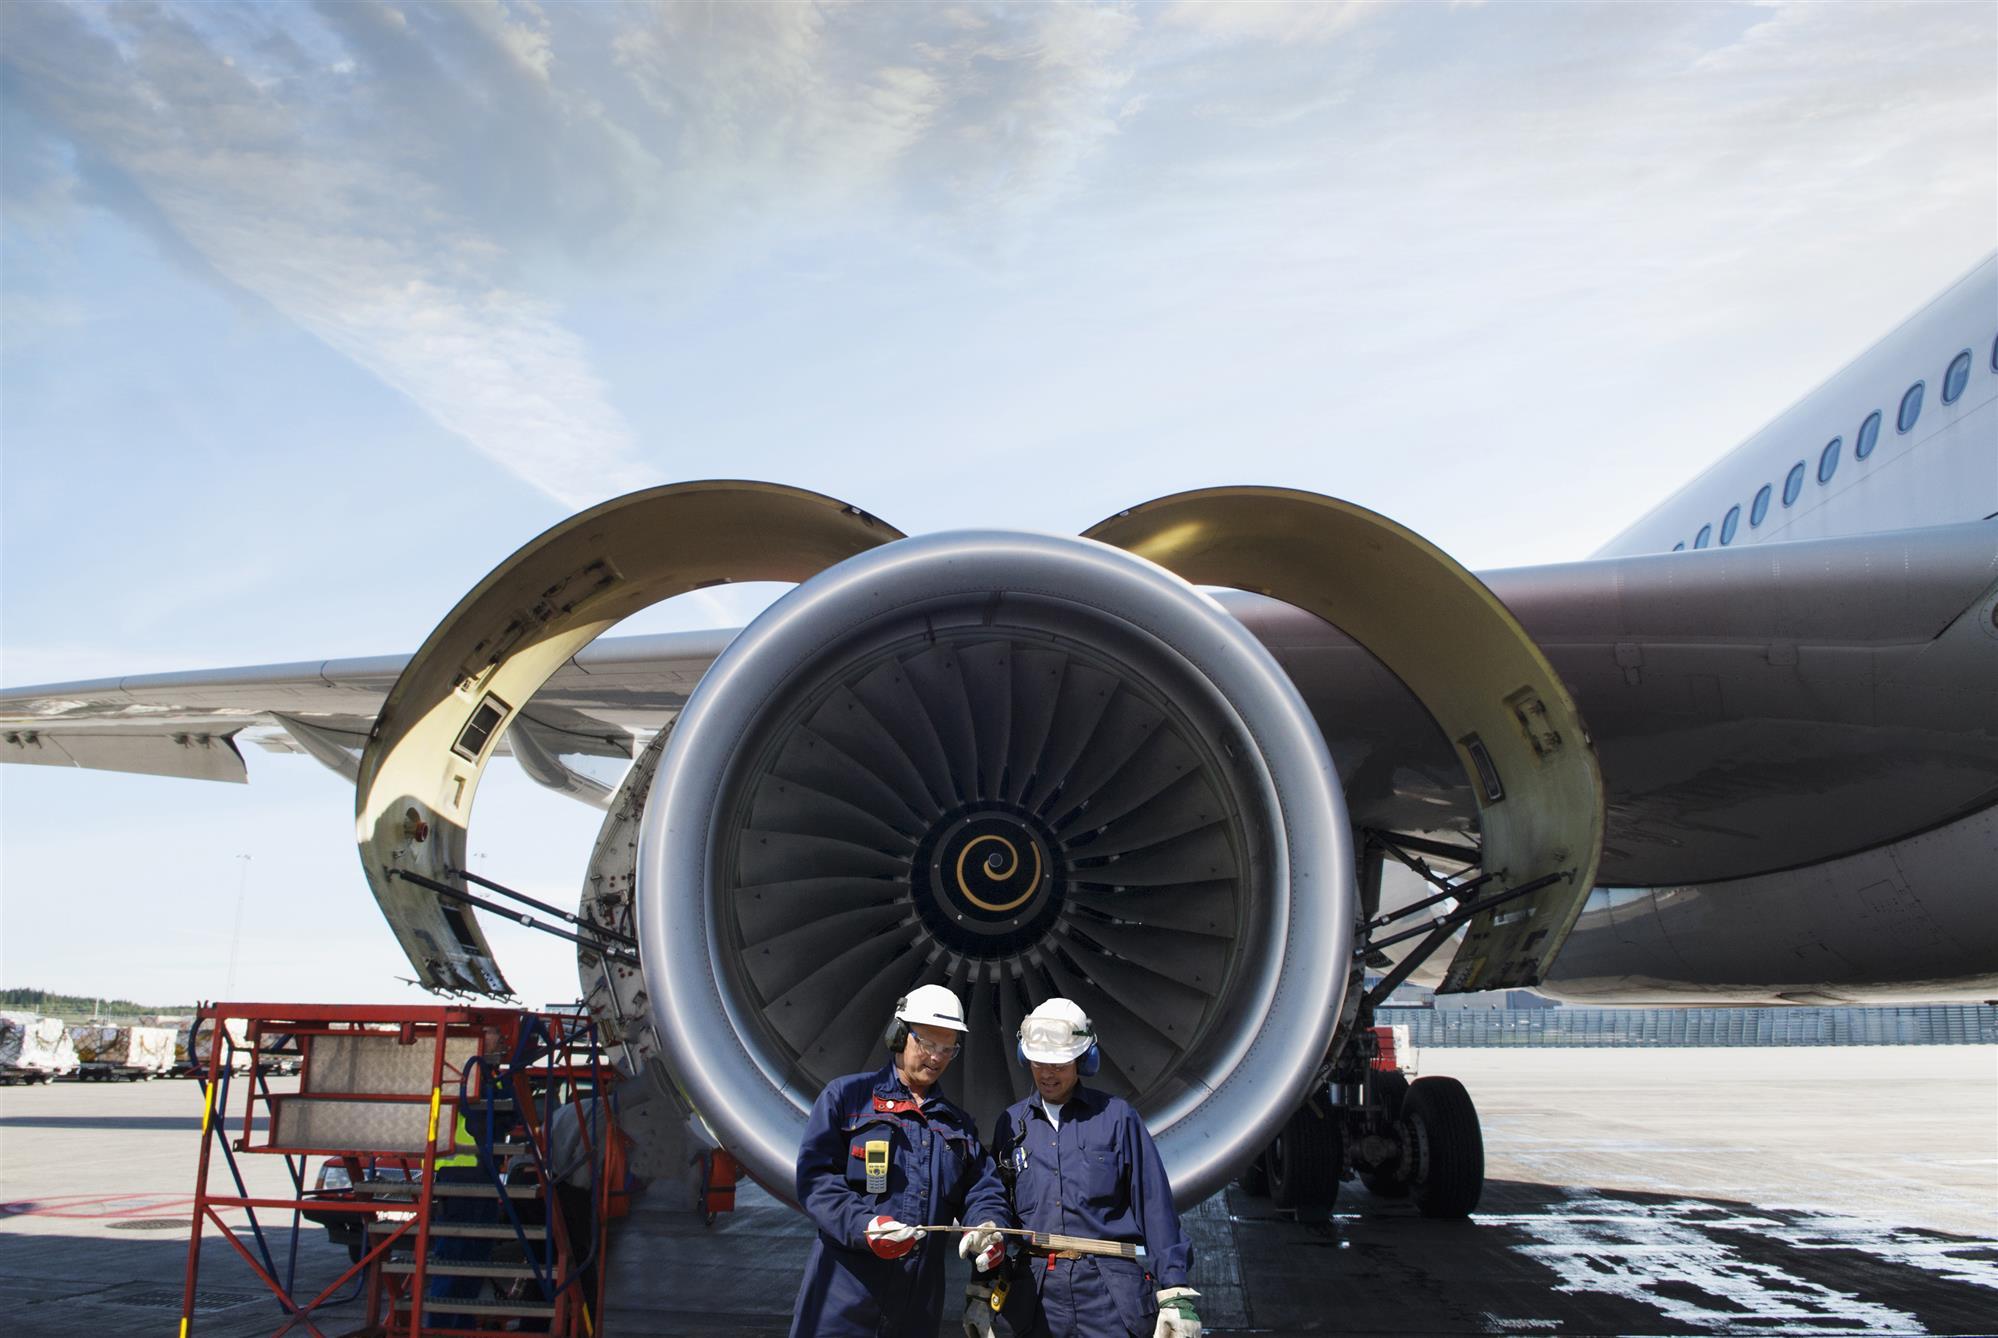 engineers working on jet engine